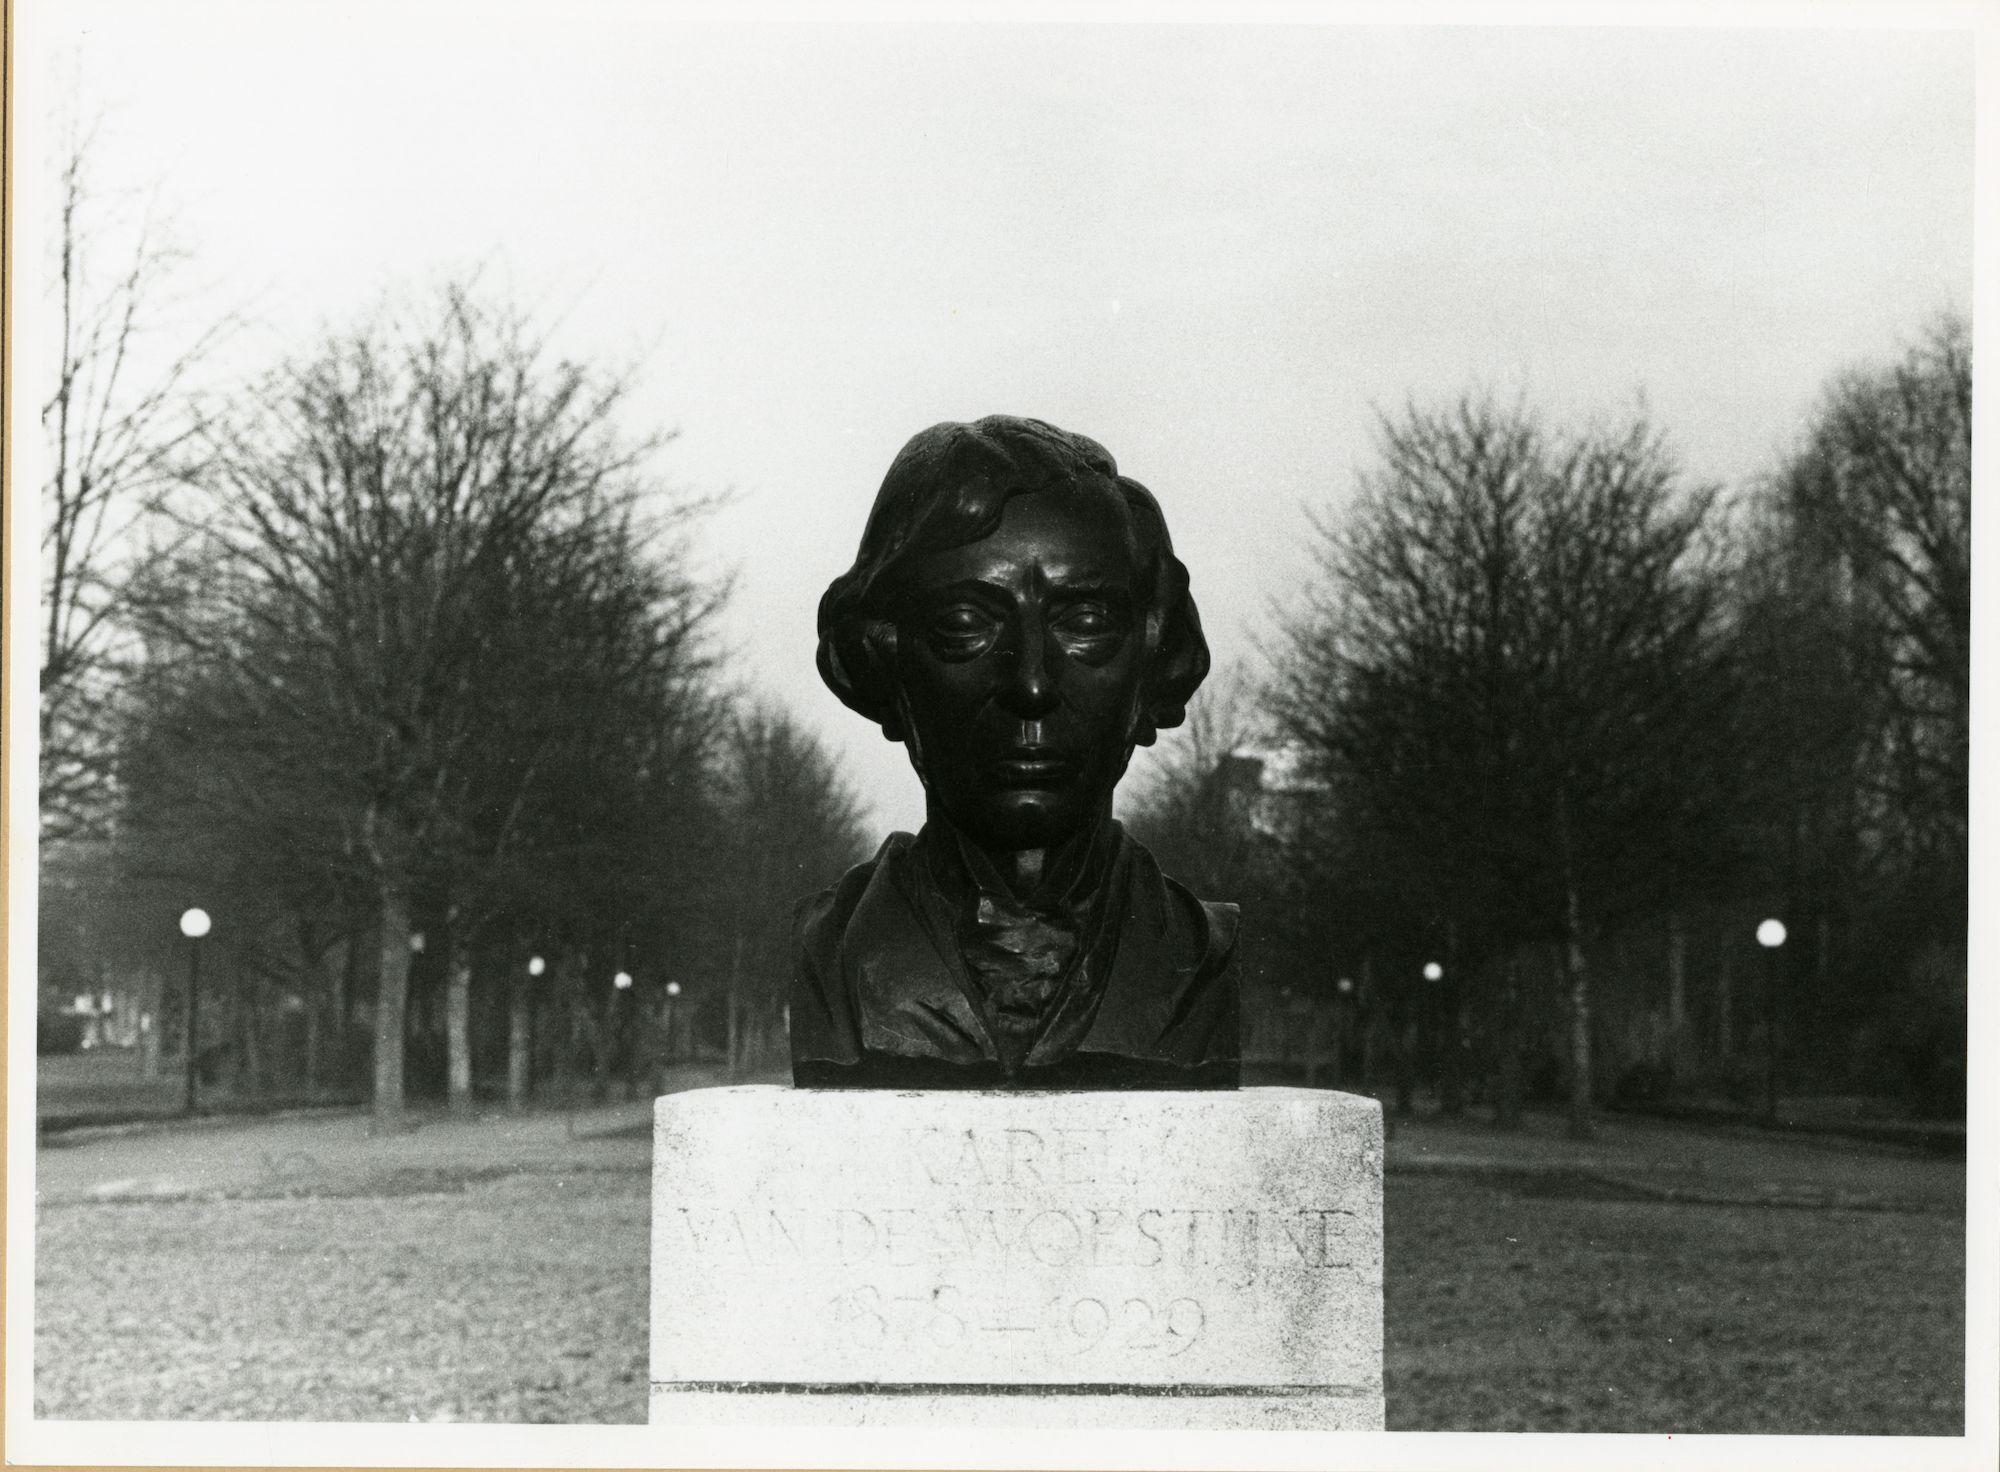 Gent: Koning Albertpark: Borstbeeld